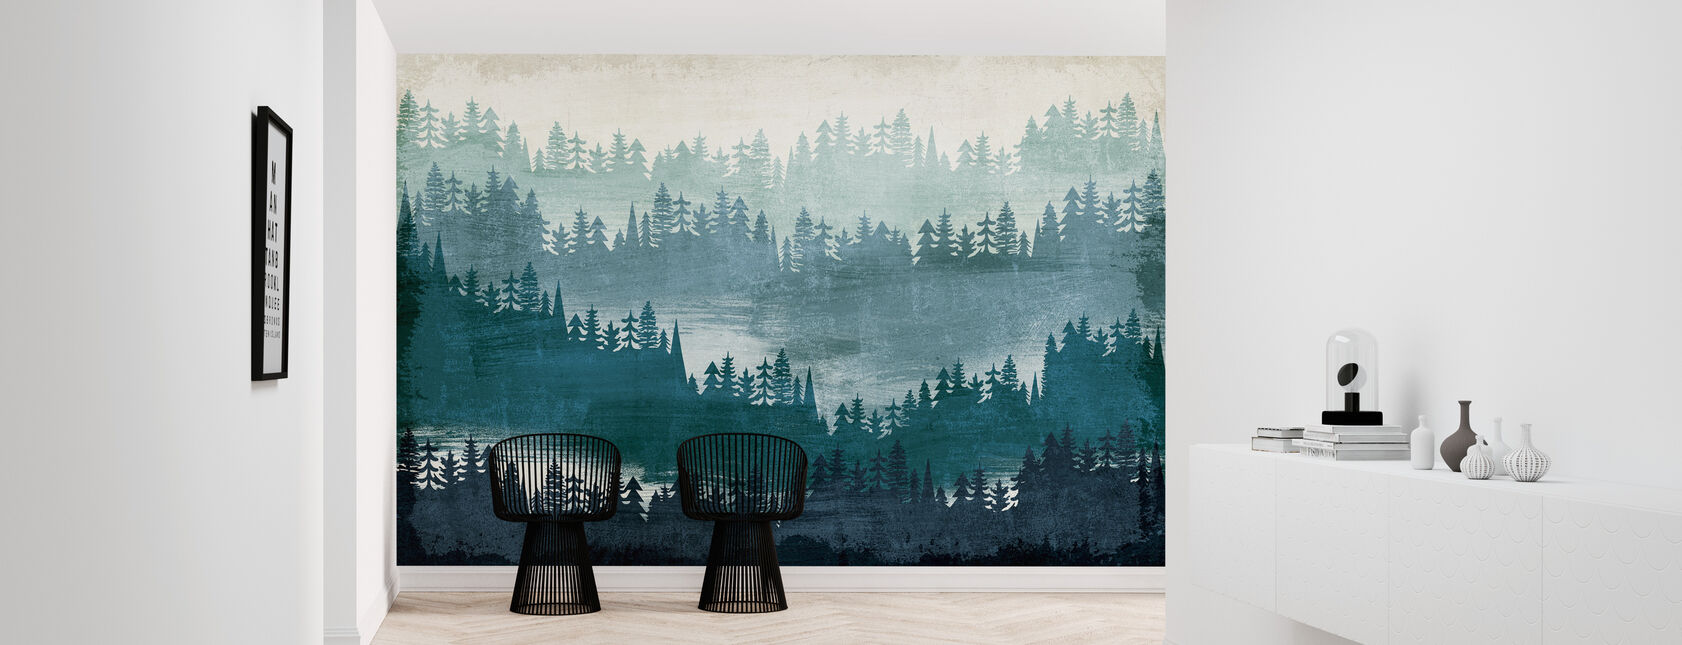 Mountainscape Blue - Wallpaper - Hallway